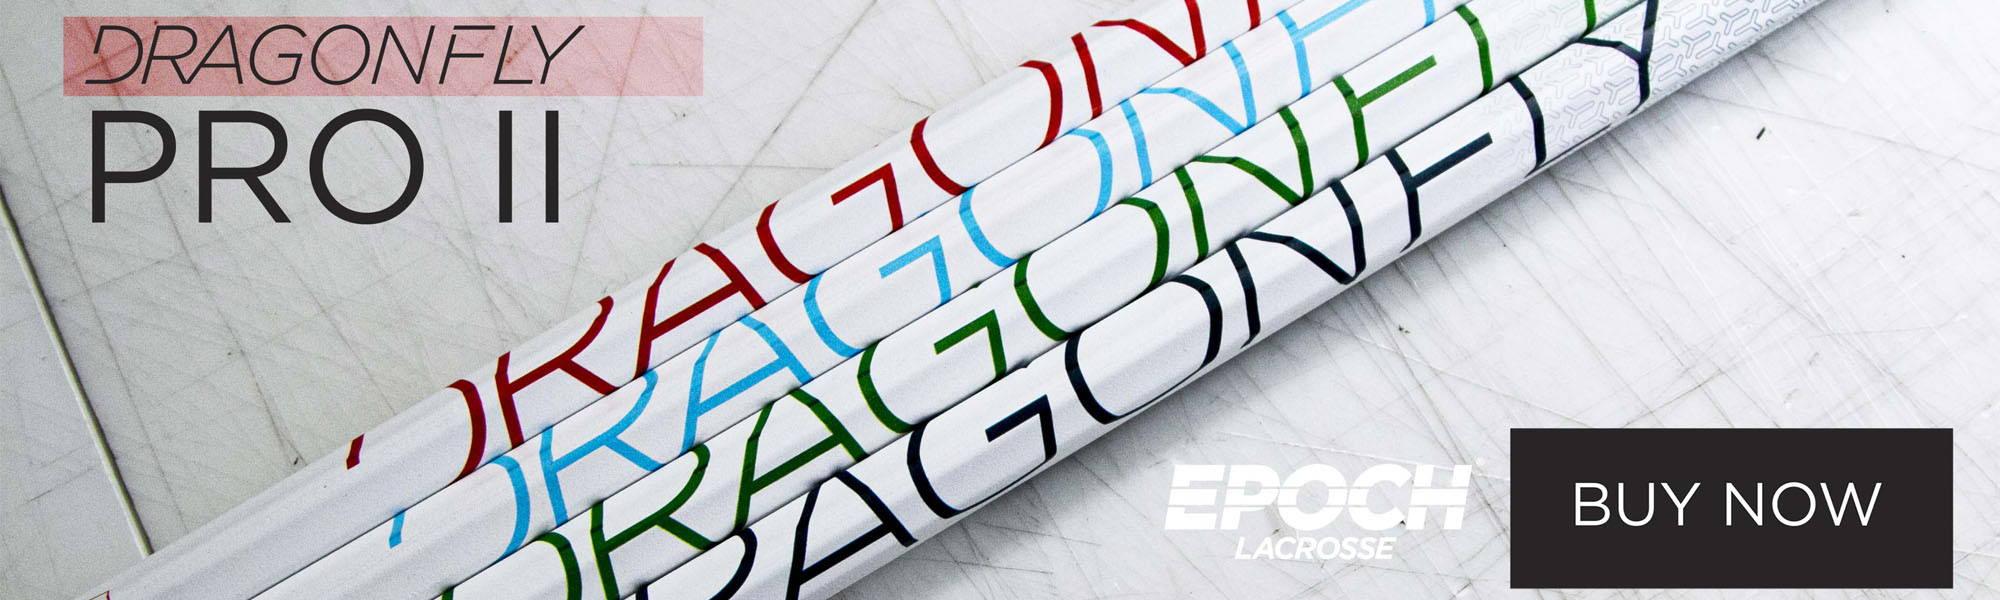 EPOCH LACROSSE DRAGONFLY PRO II TECHNO-COLORS | TOP STRING LACROSSE